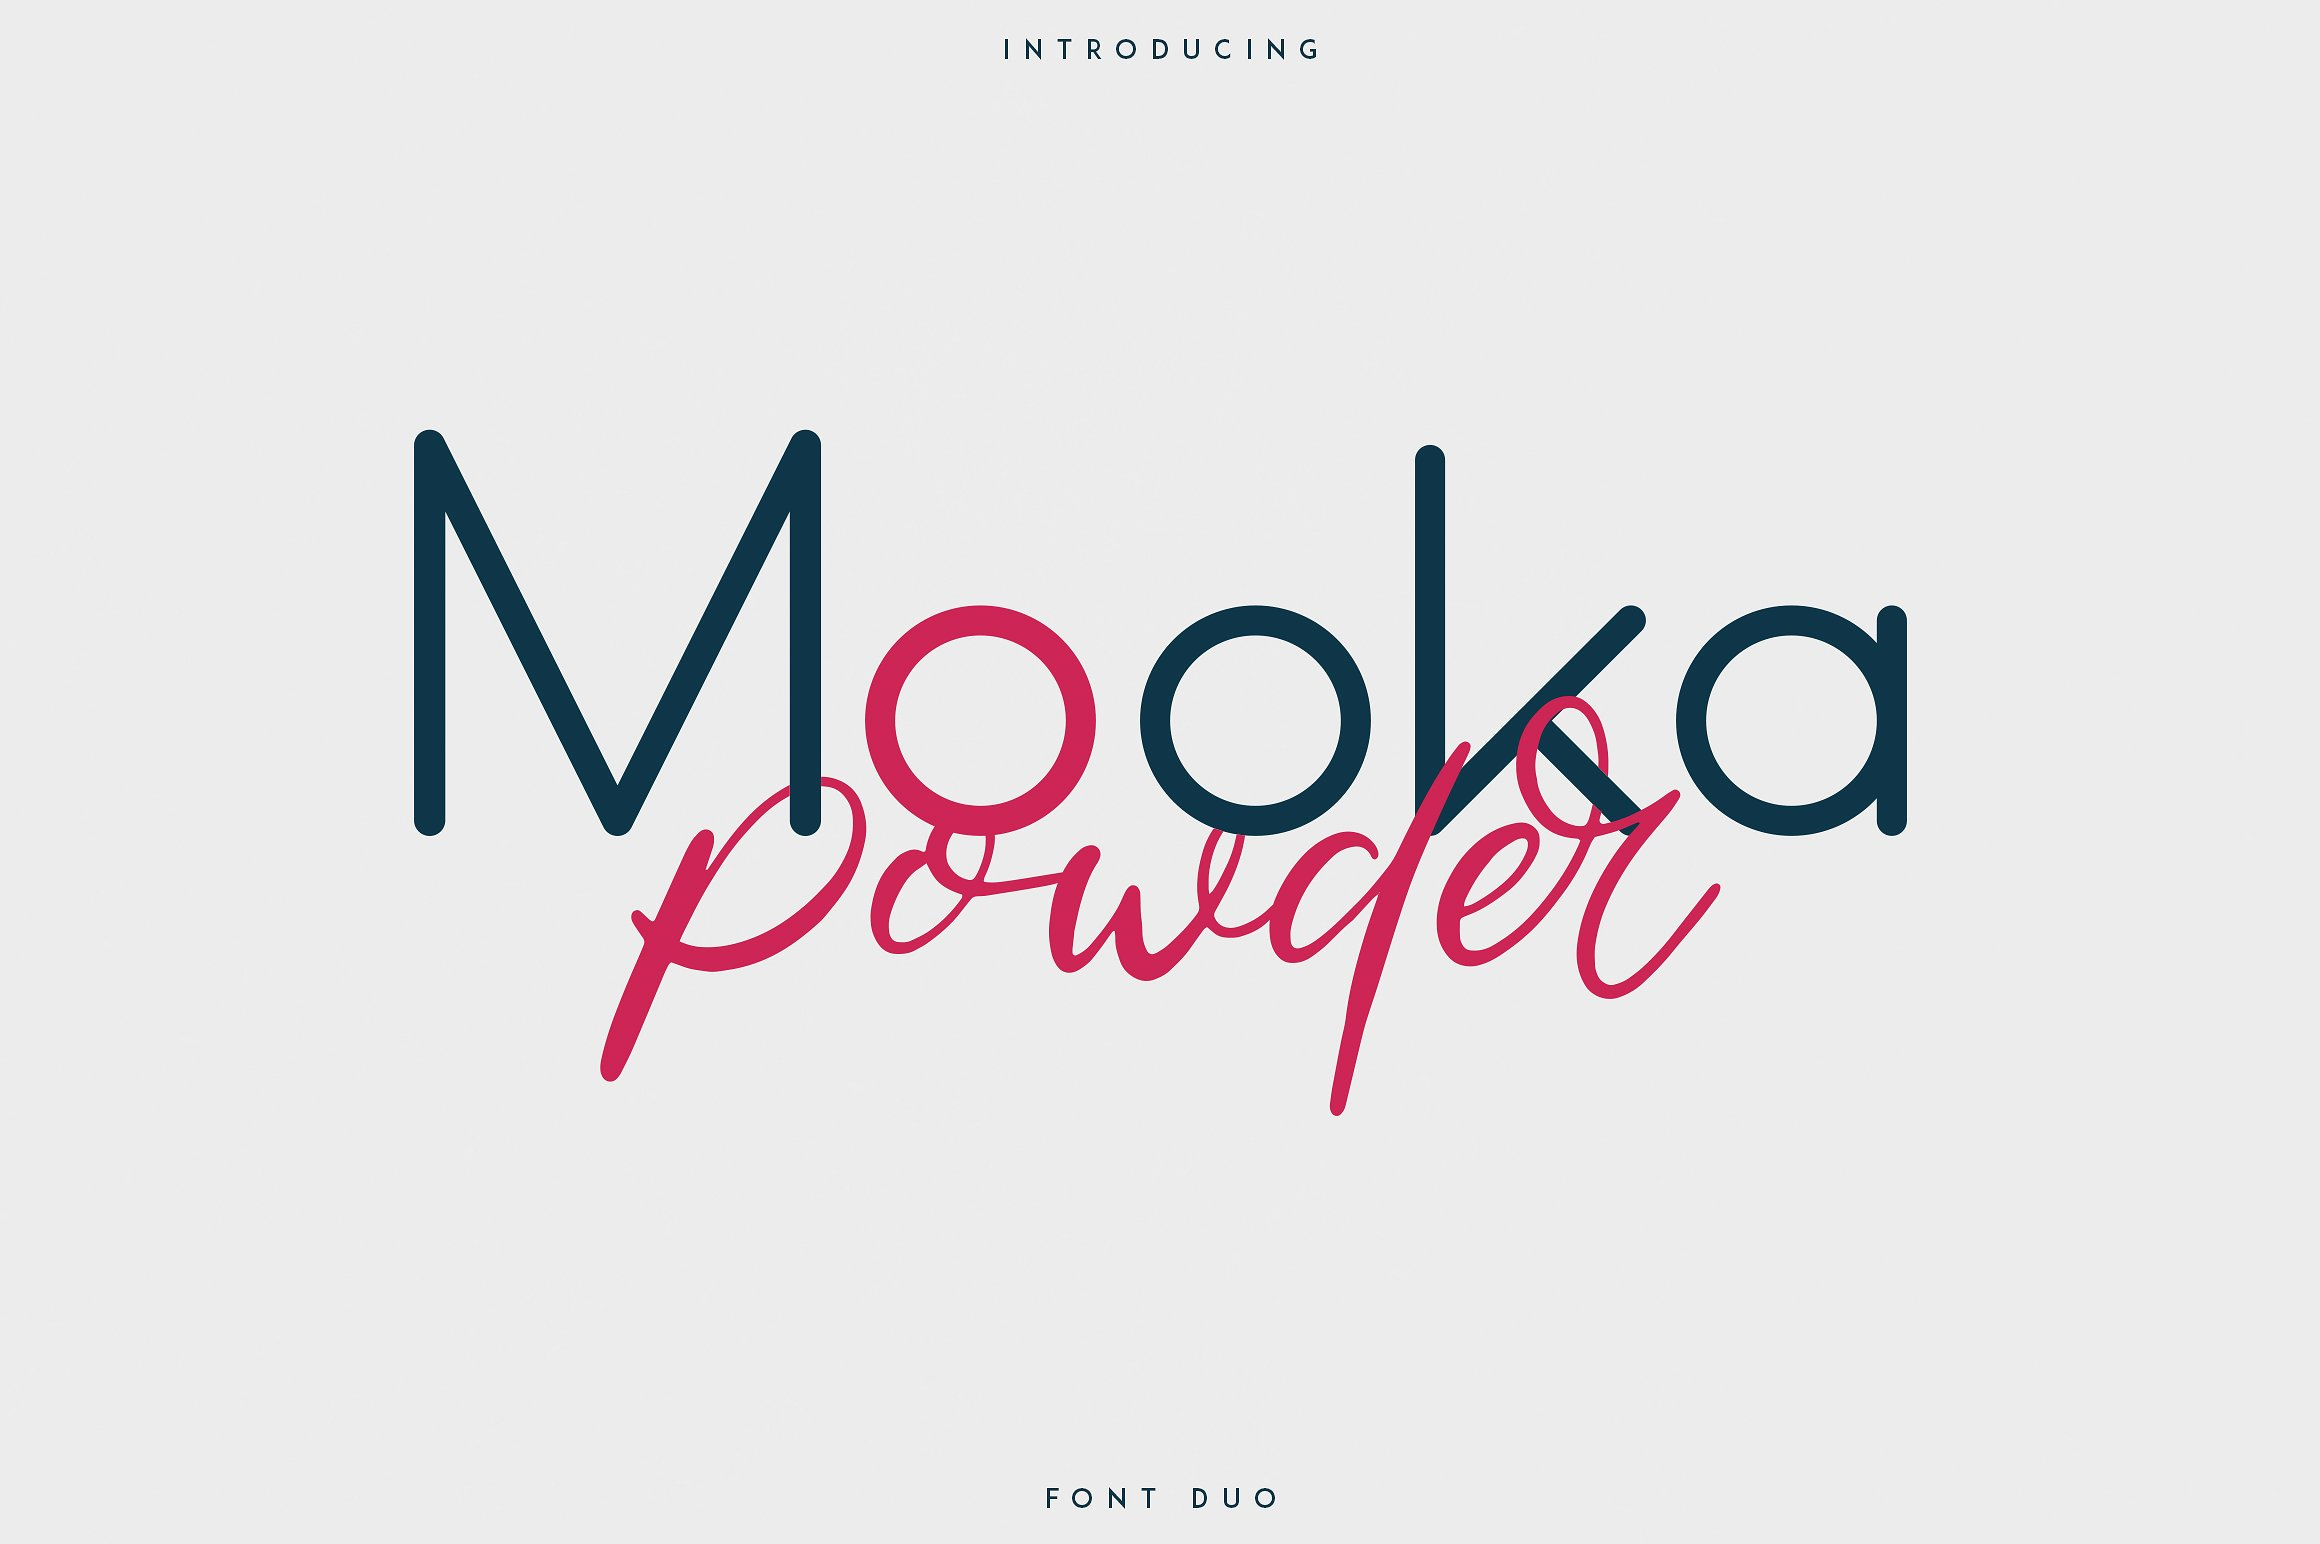 mooka-powder-font-duo